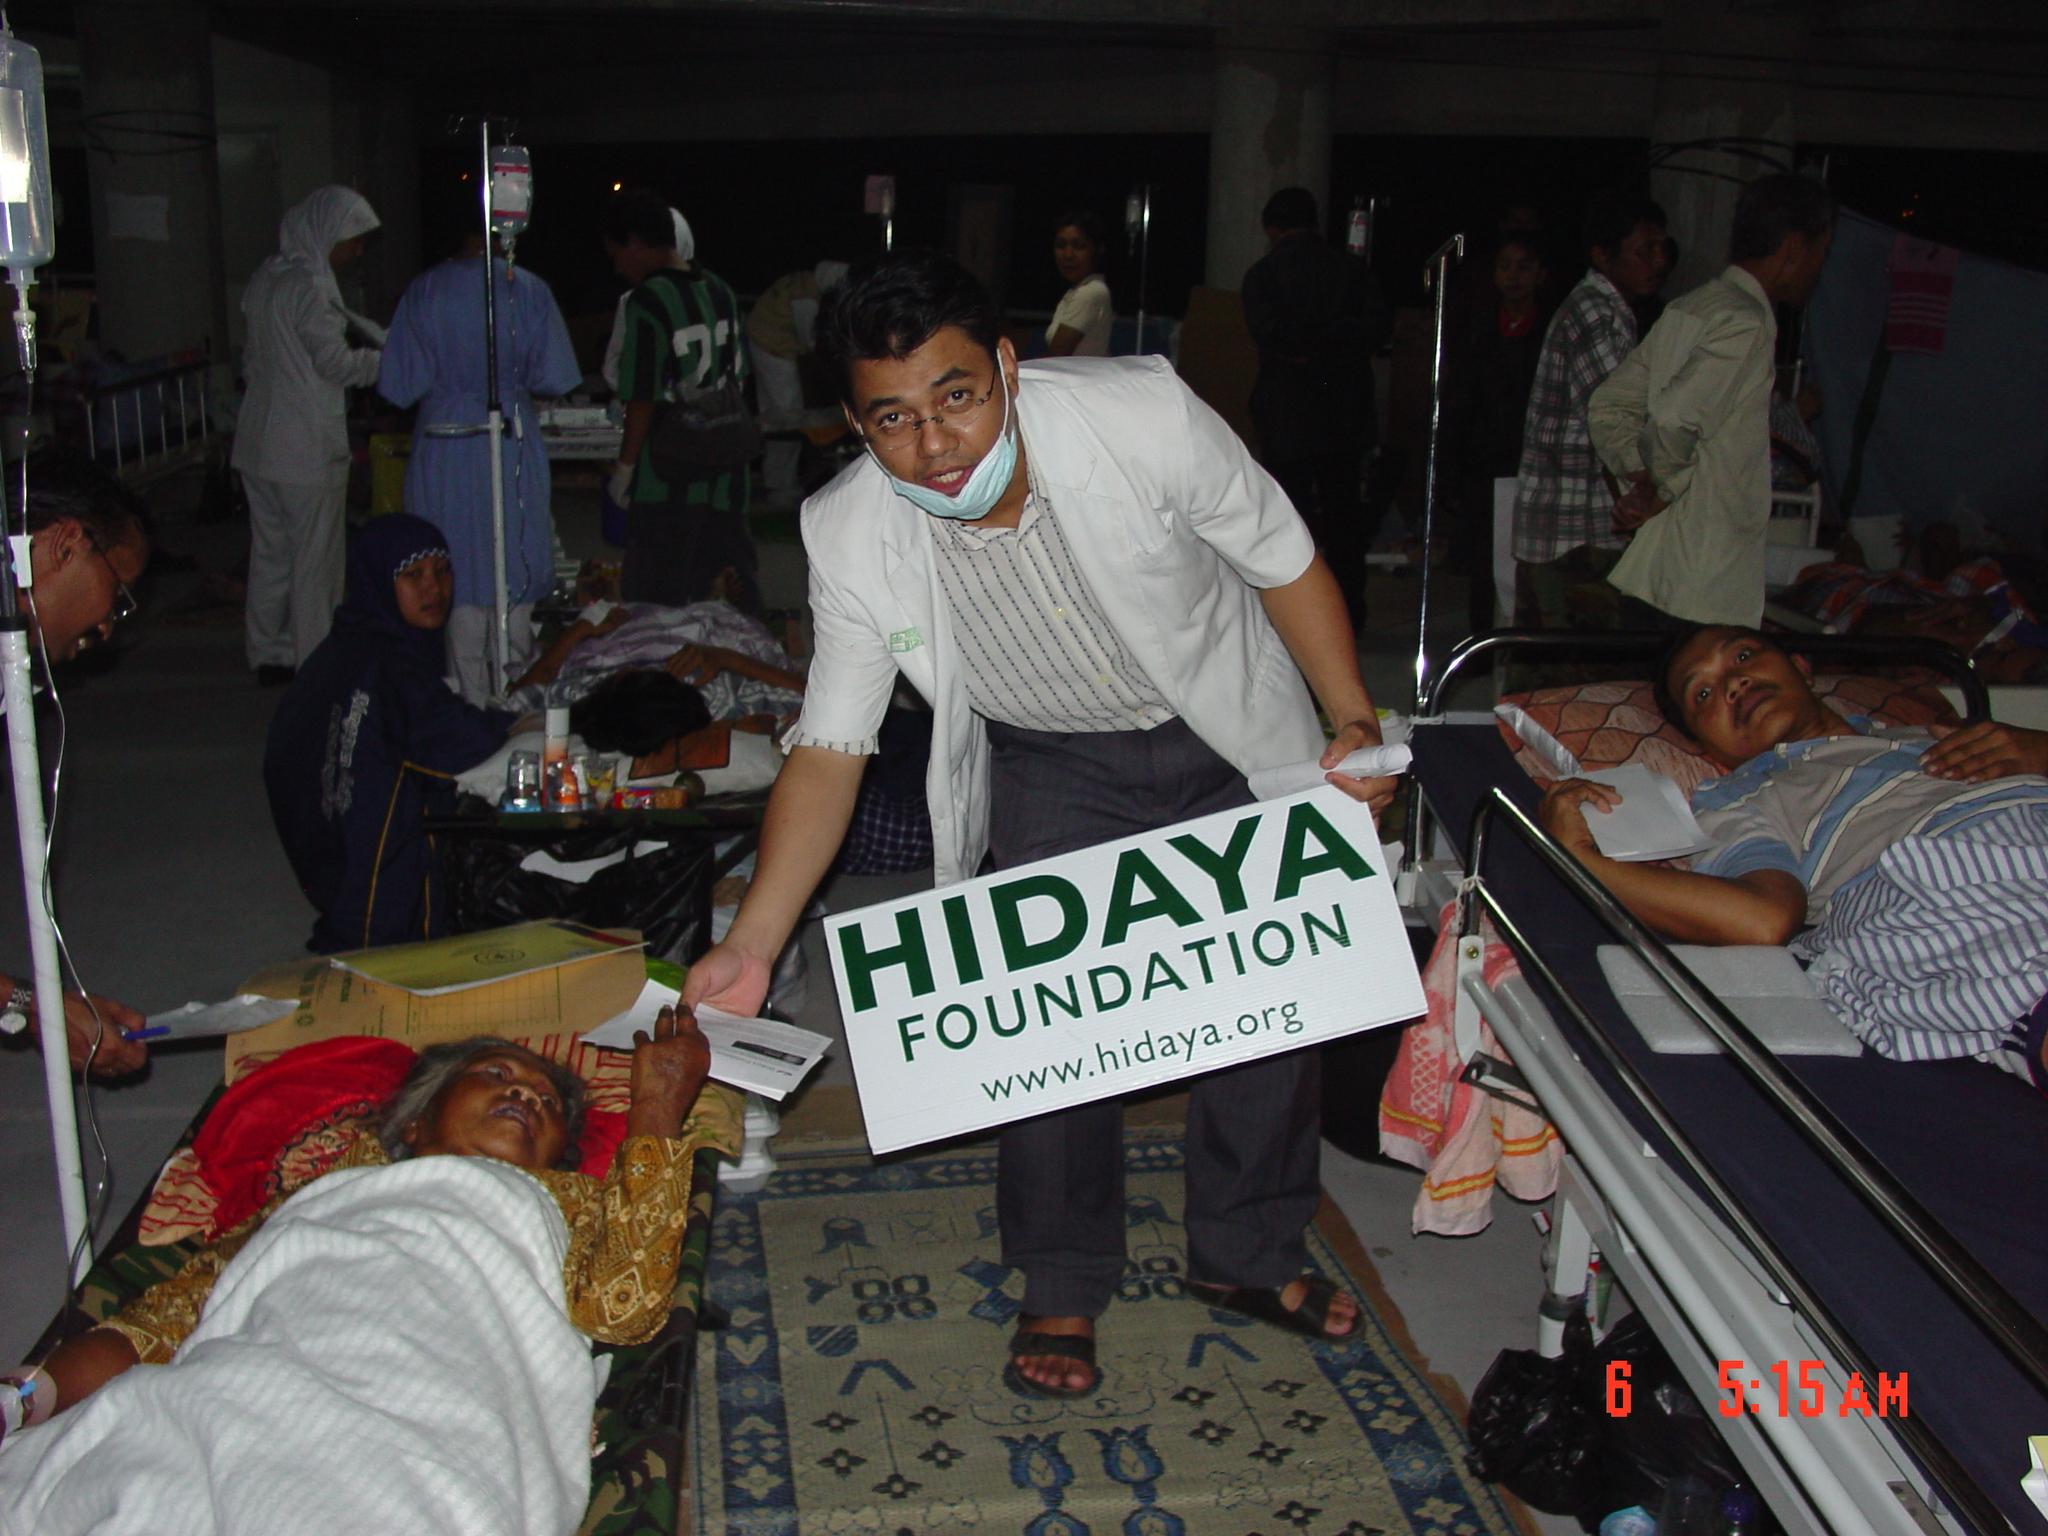 20110720_Sldo_Hcp_Aaqureshi_Bdsanjrani_Sind_Shp_Villrahimabad_Balochform_Medicalcamp_40